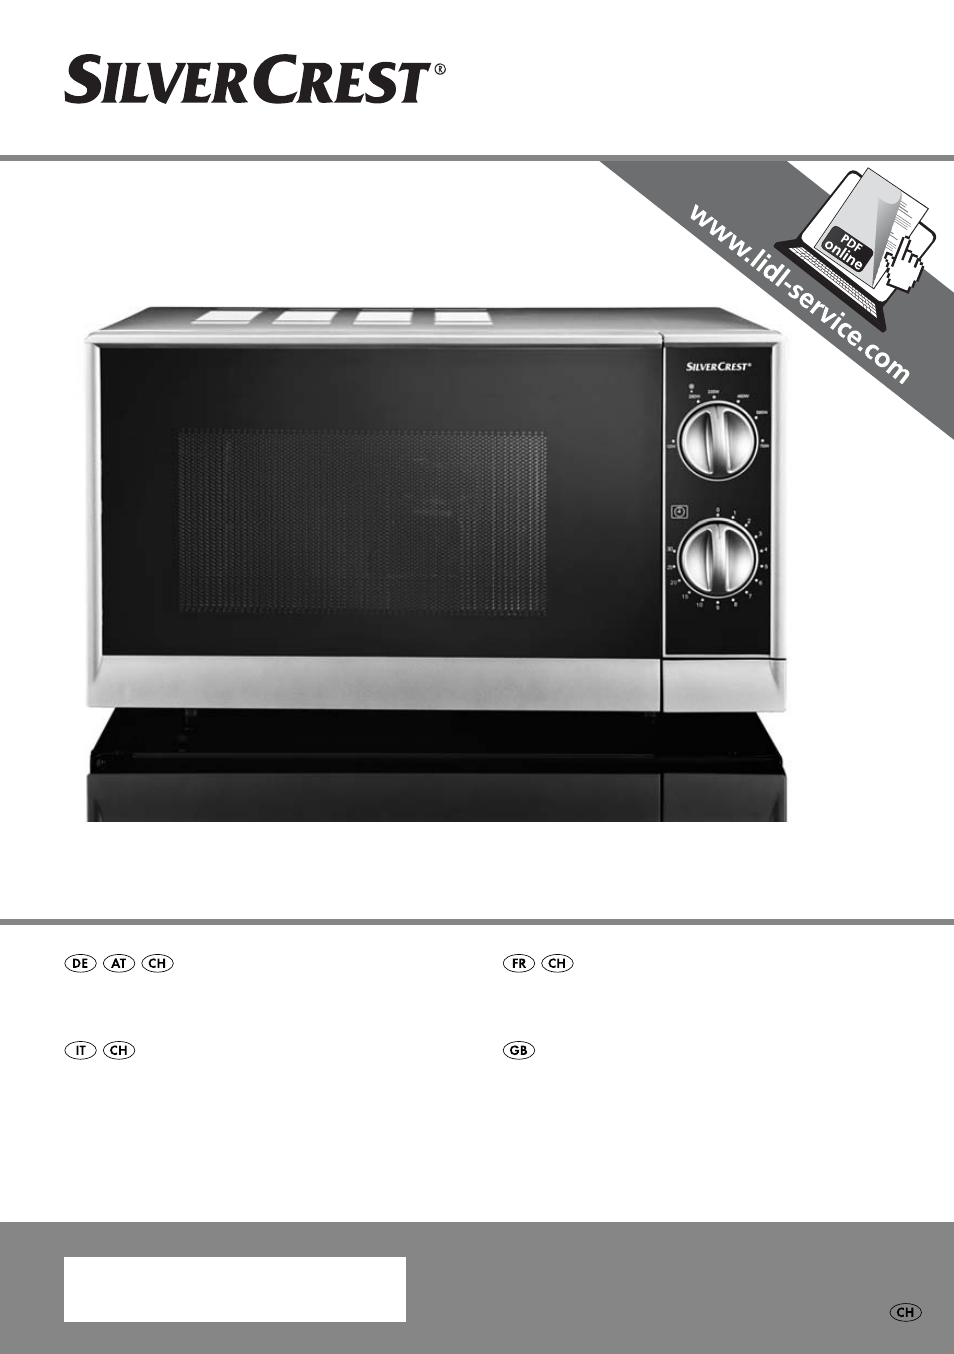 Silvercrest Microwave Manual